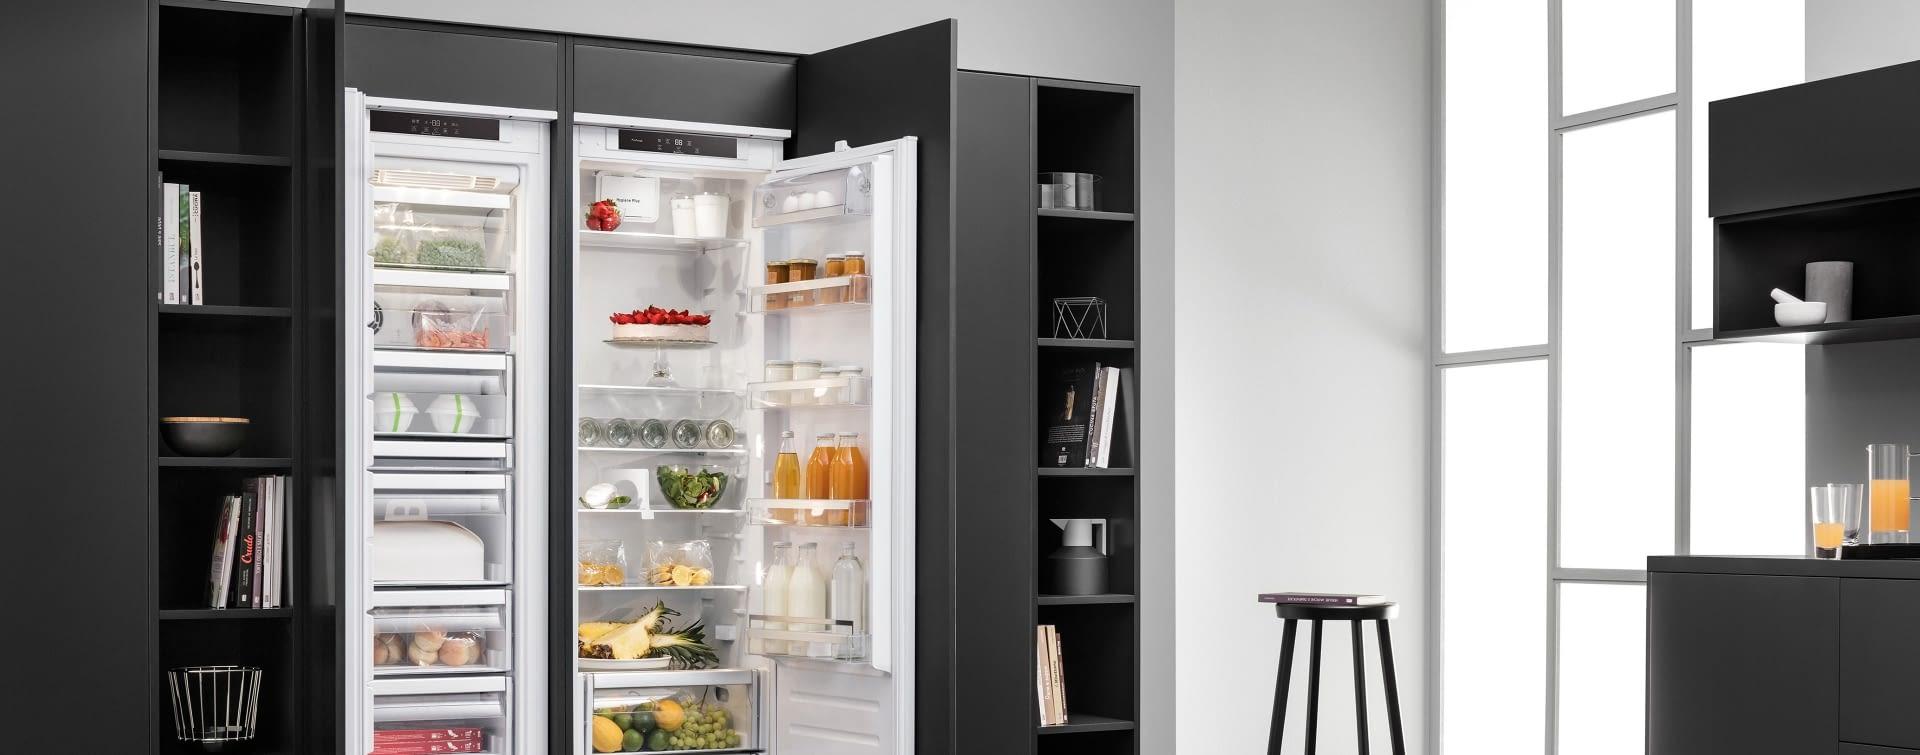 Side-by-Side Kühlschrank - Marquardt Küchen